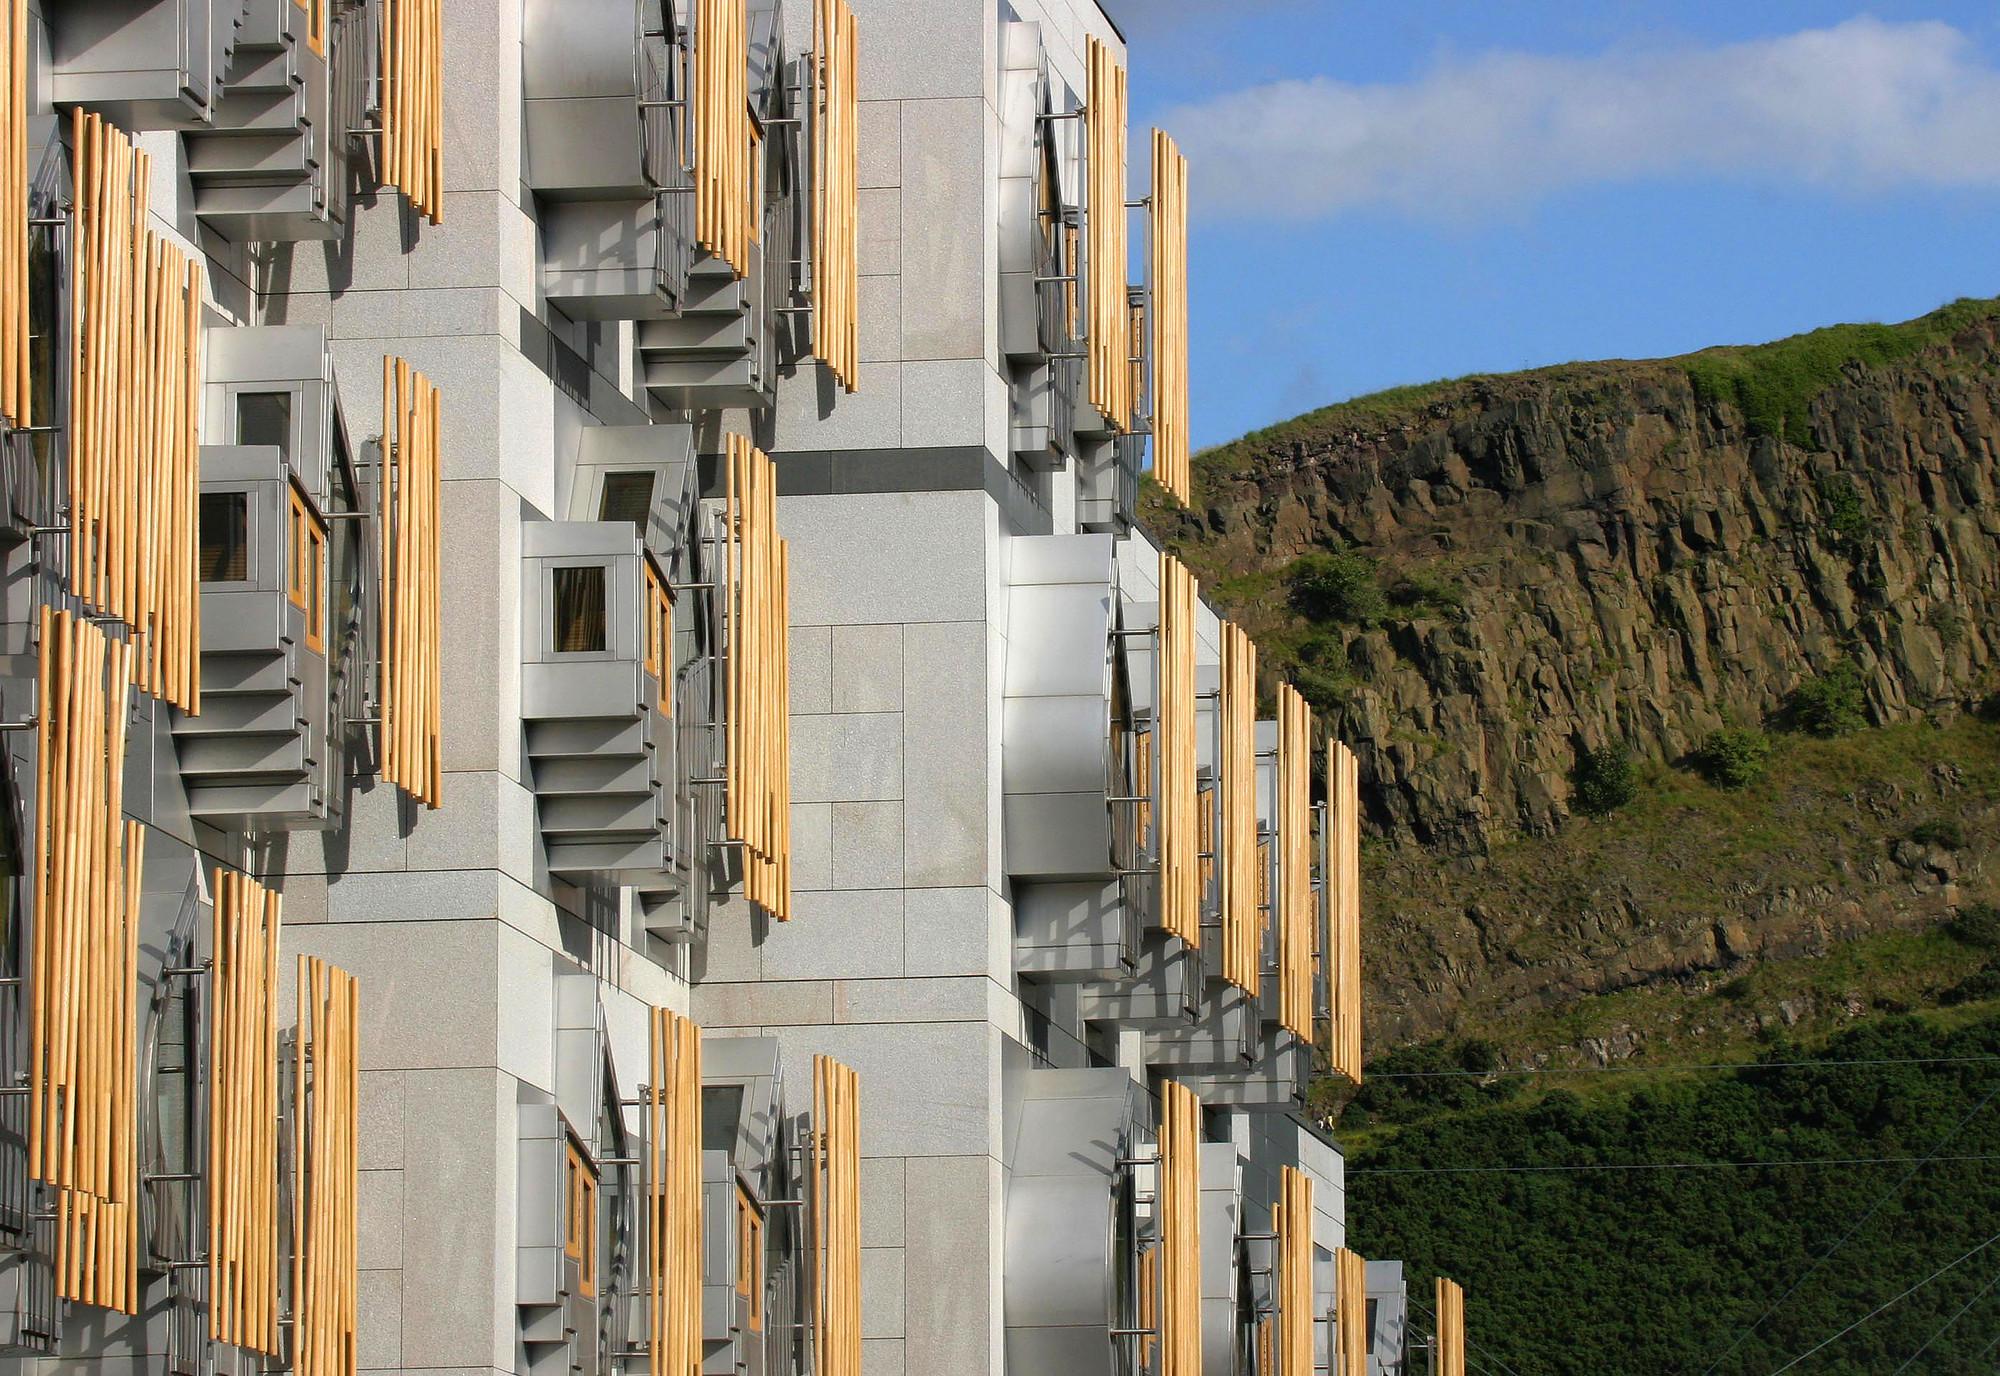 Edificio de Oficinas MSP. Image © Scottish Parliamentary Corporate Body - 2012